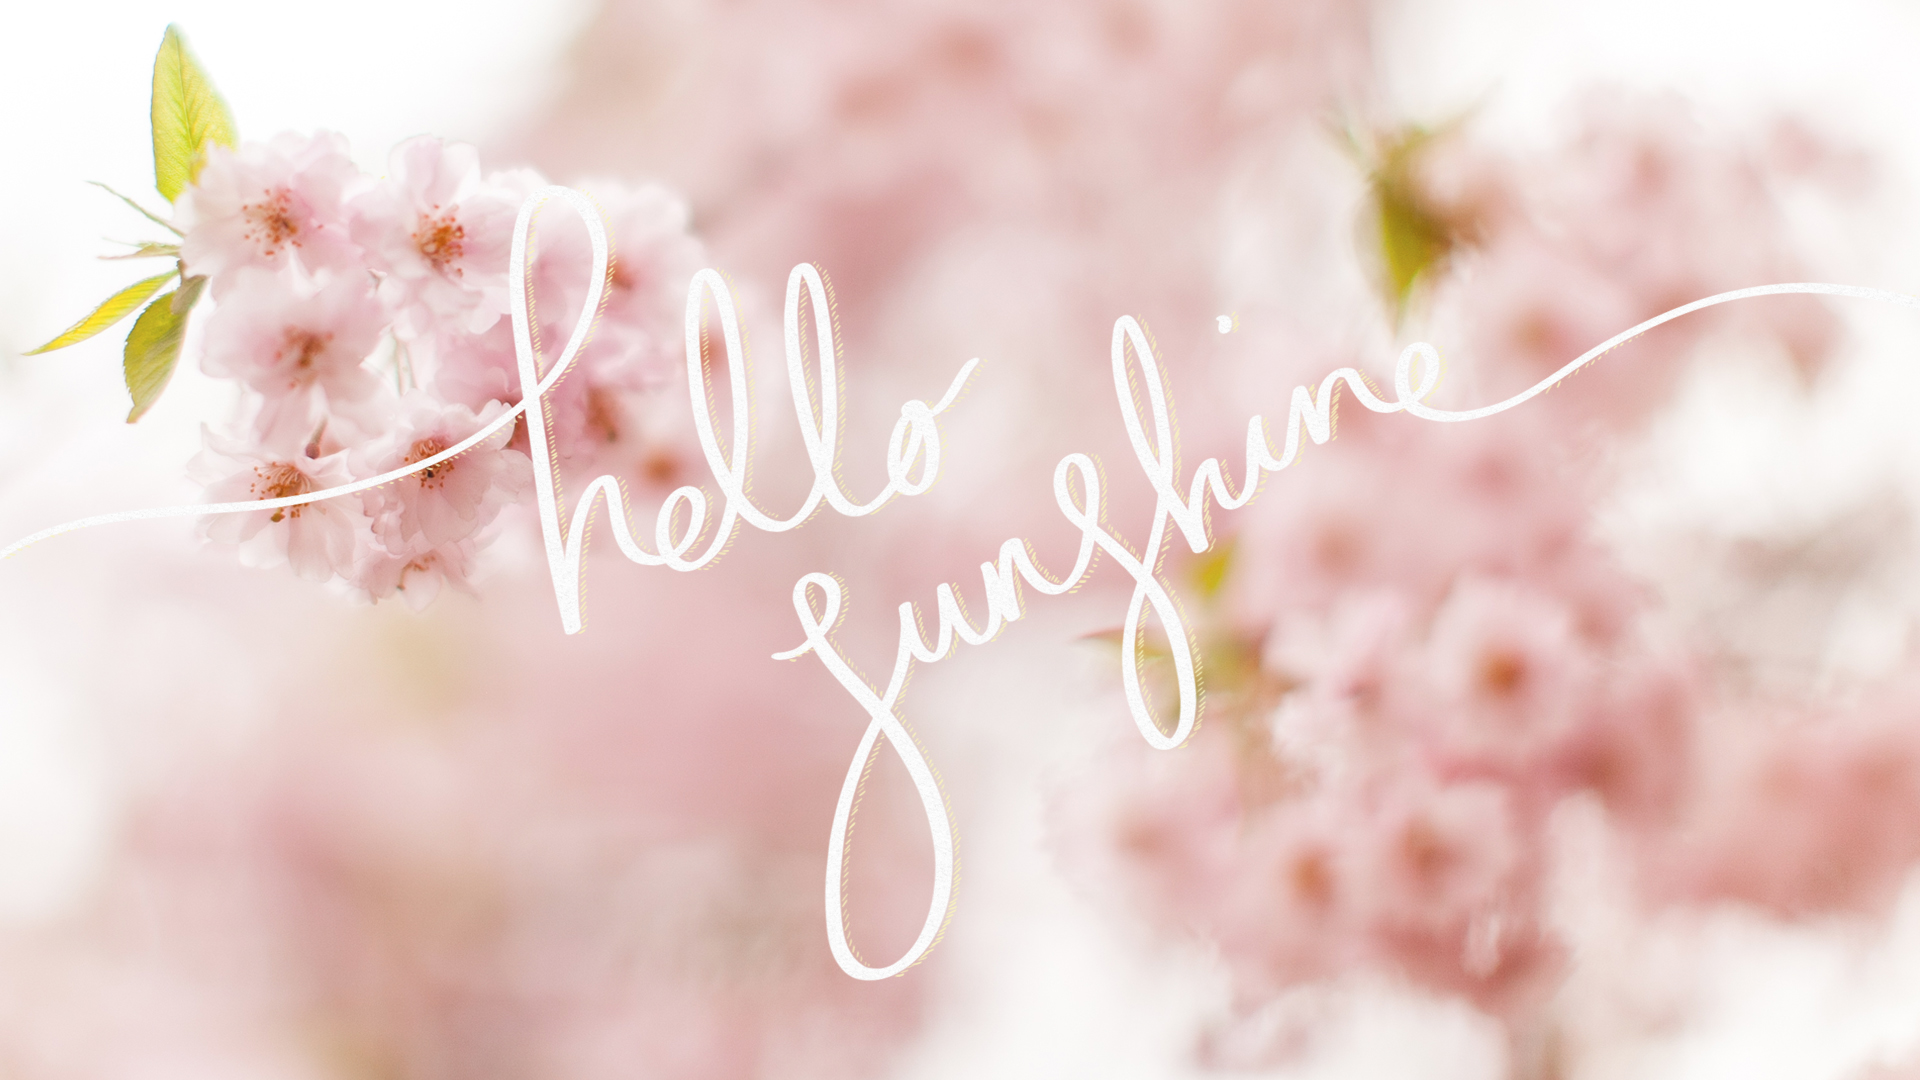 Cute Pineapple Big Wallpapers Hello Sunshine A Free Cherry Blossom Desktop Wallpaper